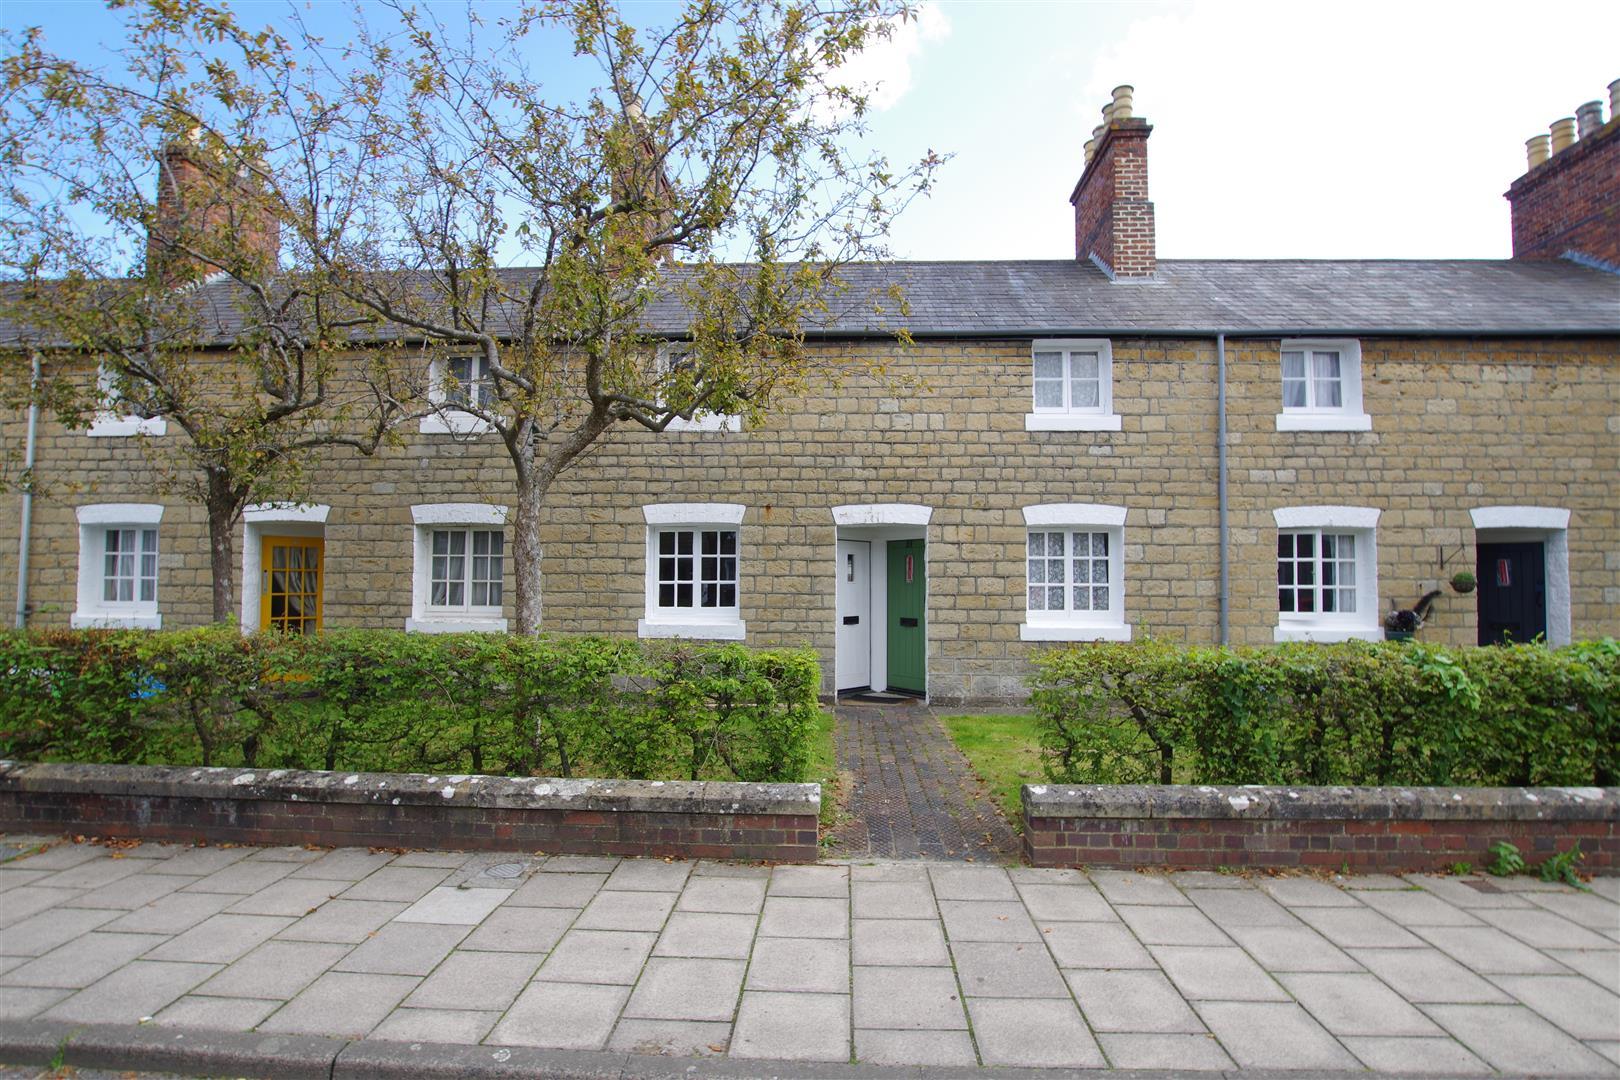 Exeter Street, Railway Village, Swindon